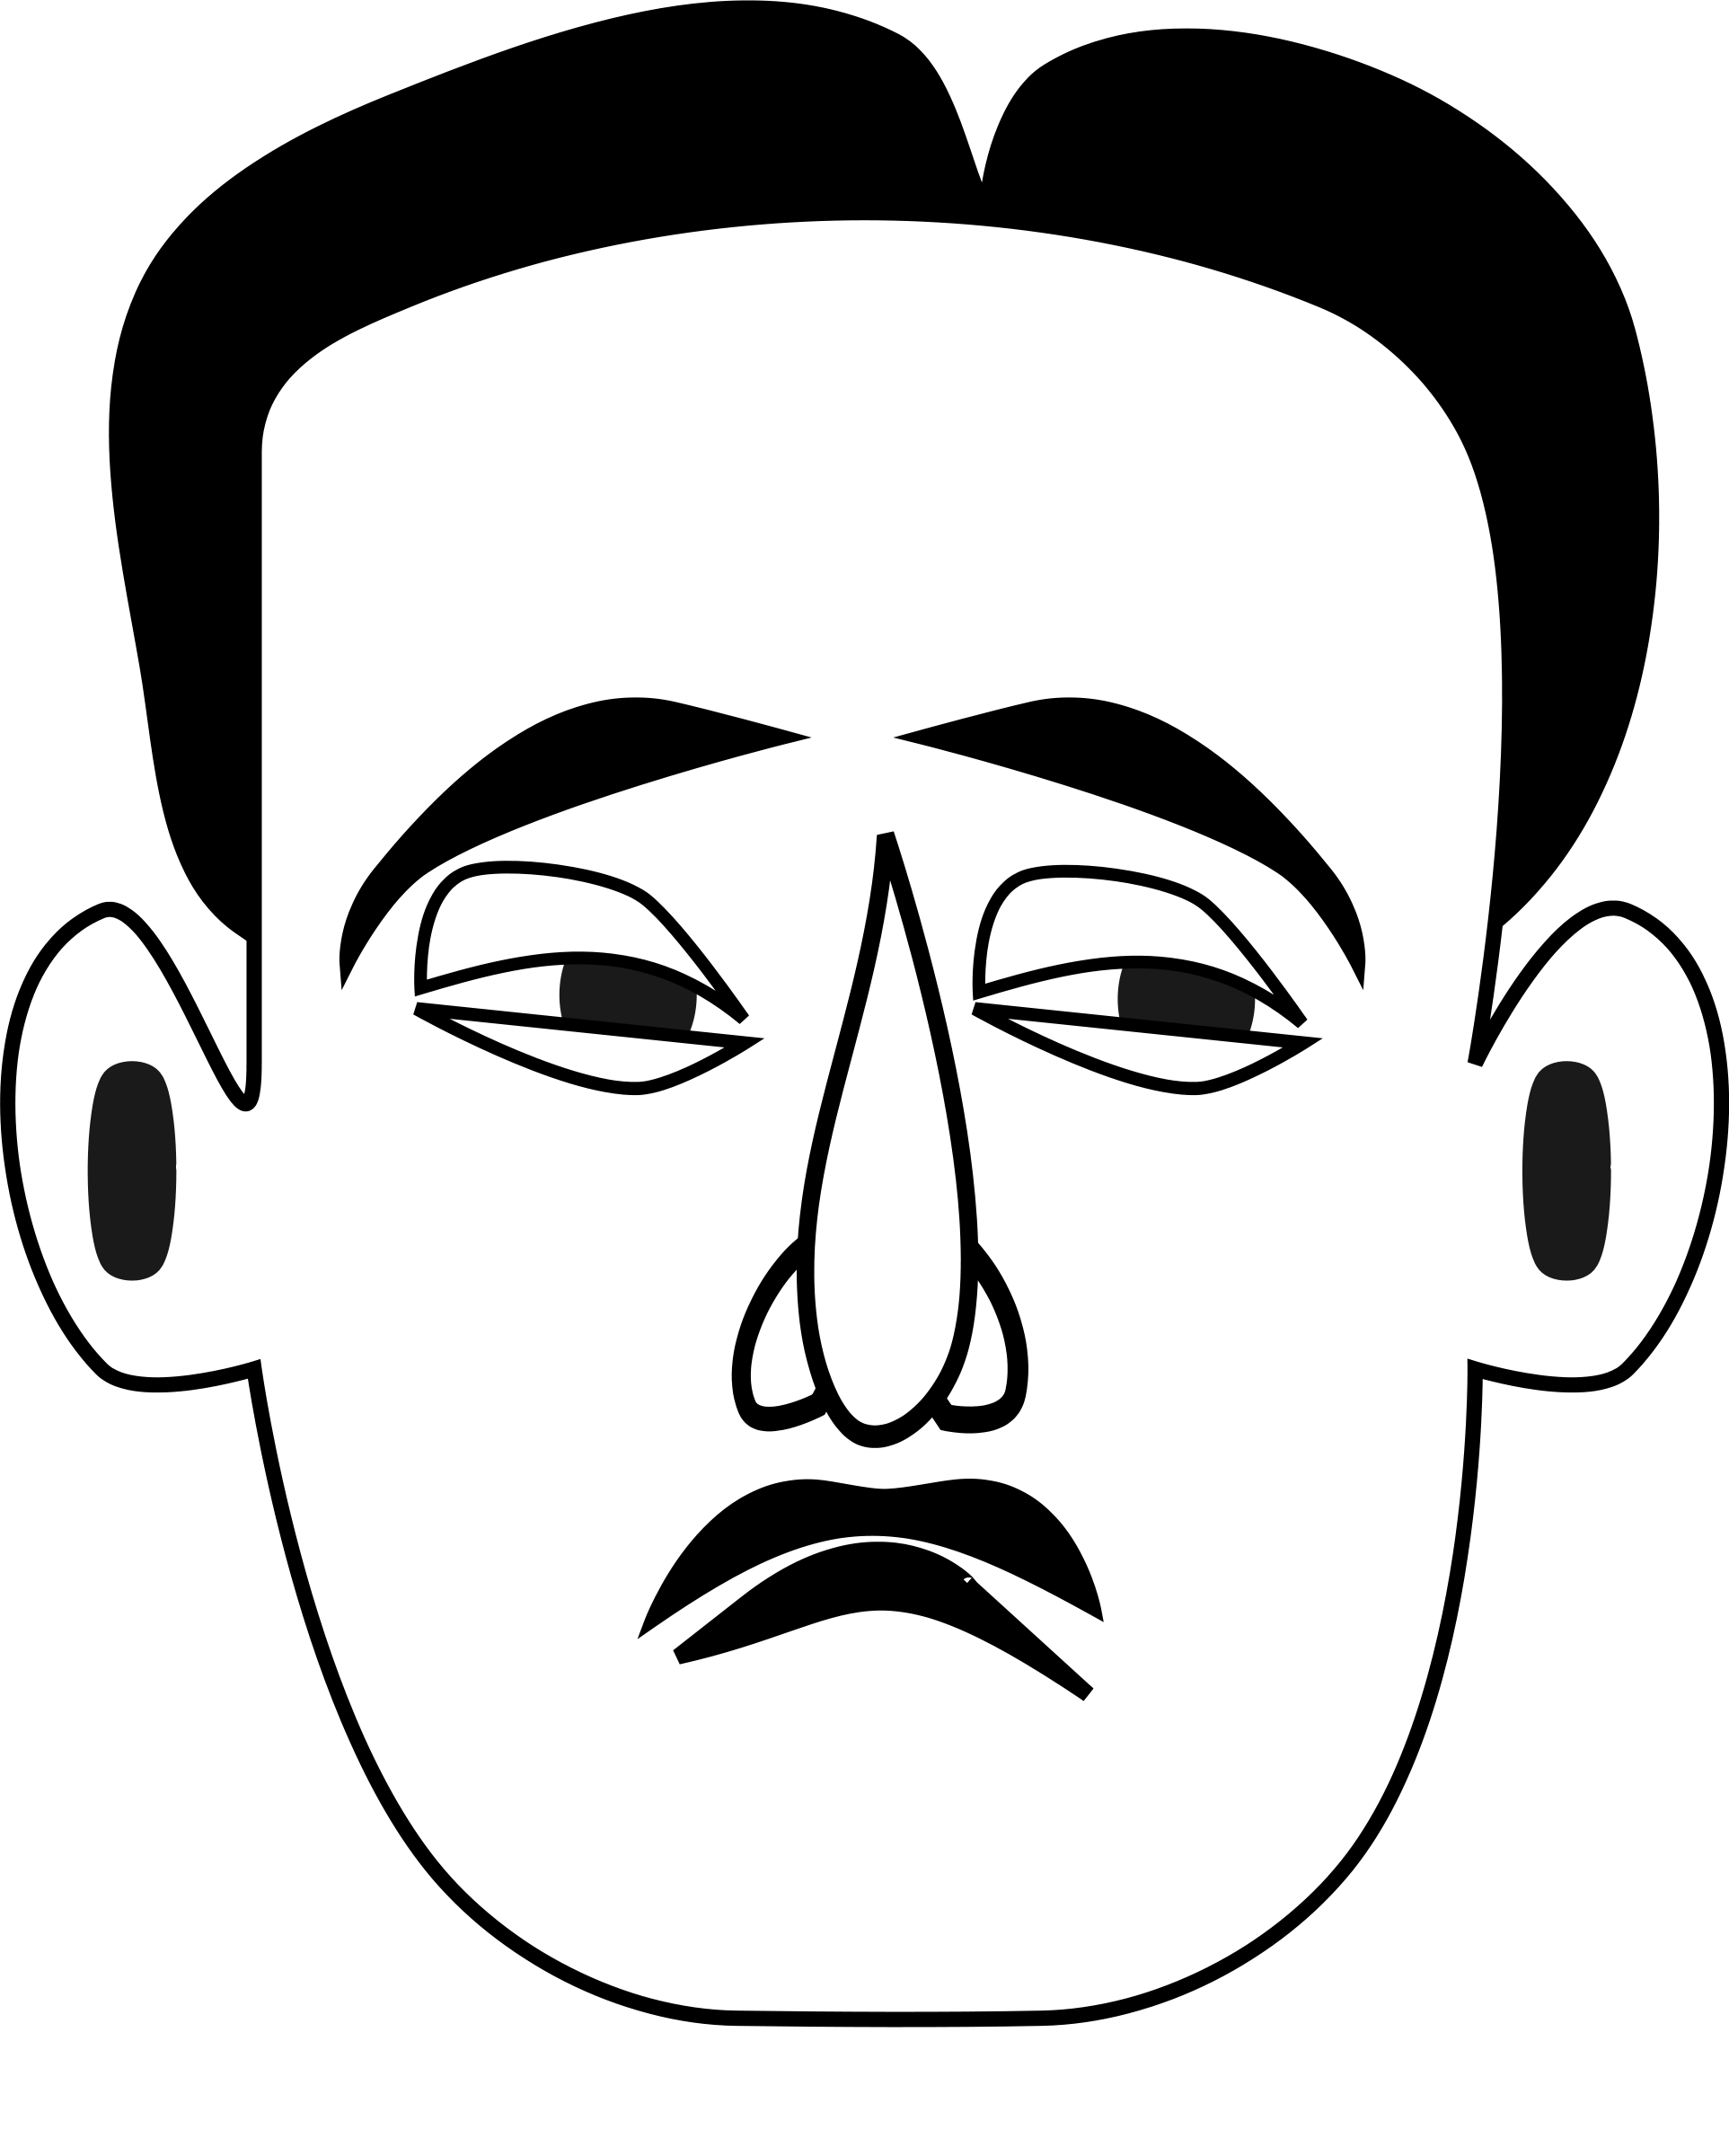 Pumpkin face clipart black and white banner Sad Face Images | Free download best Sad Face Images on ClipArtMag.com banner